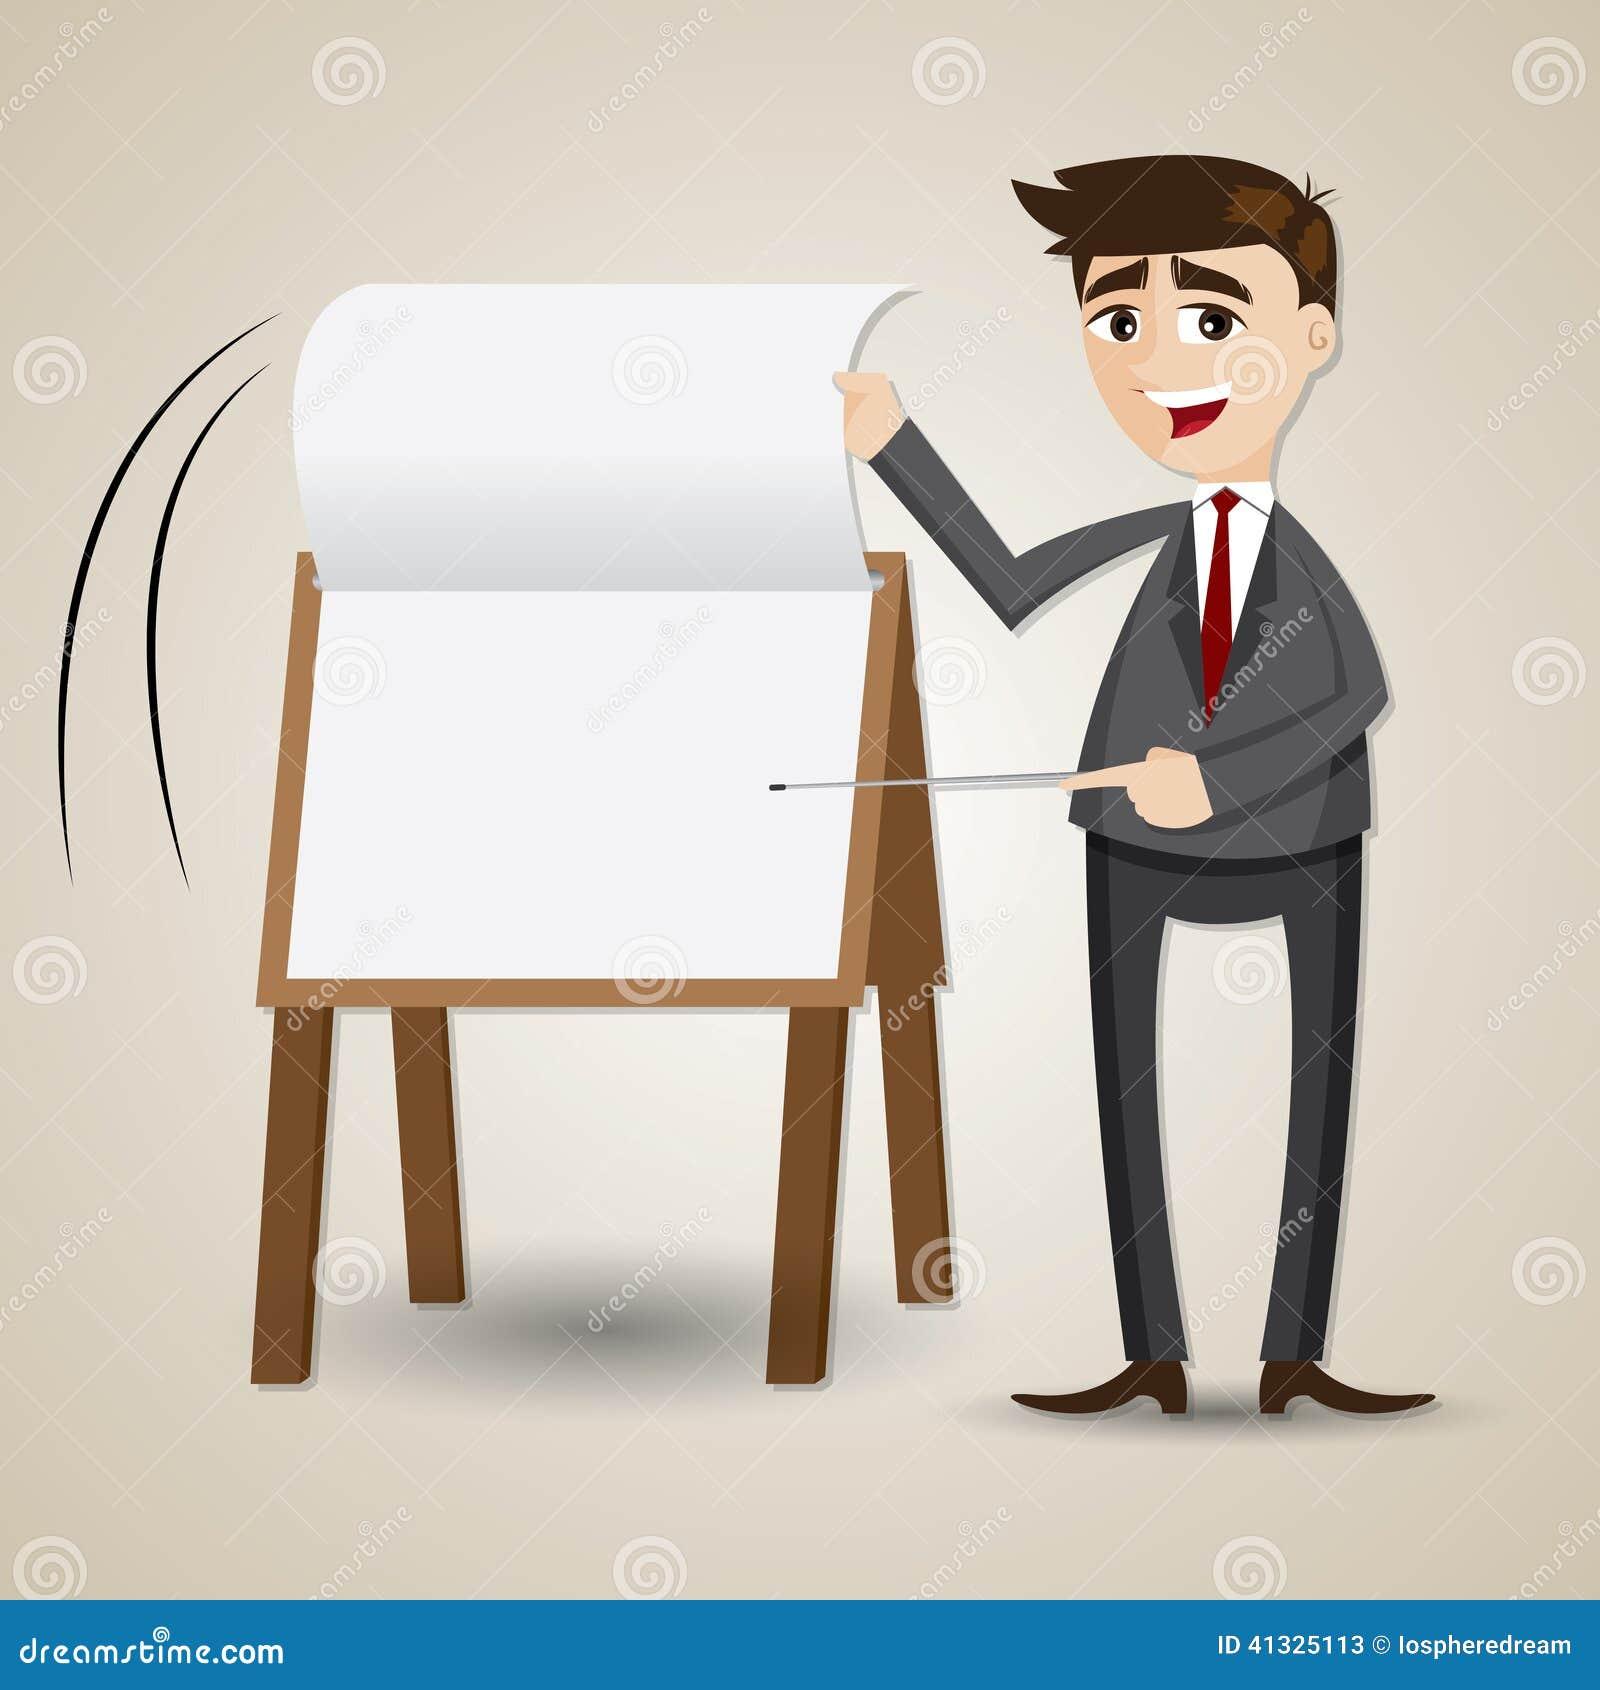 thesis committee meeting presentation